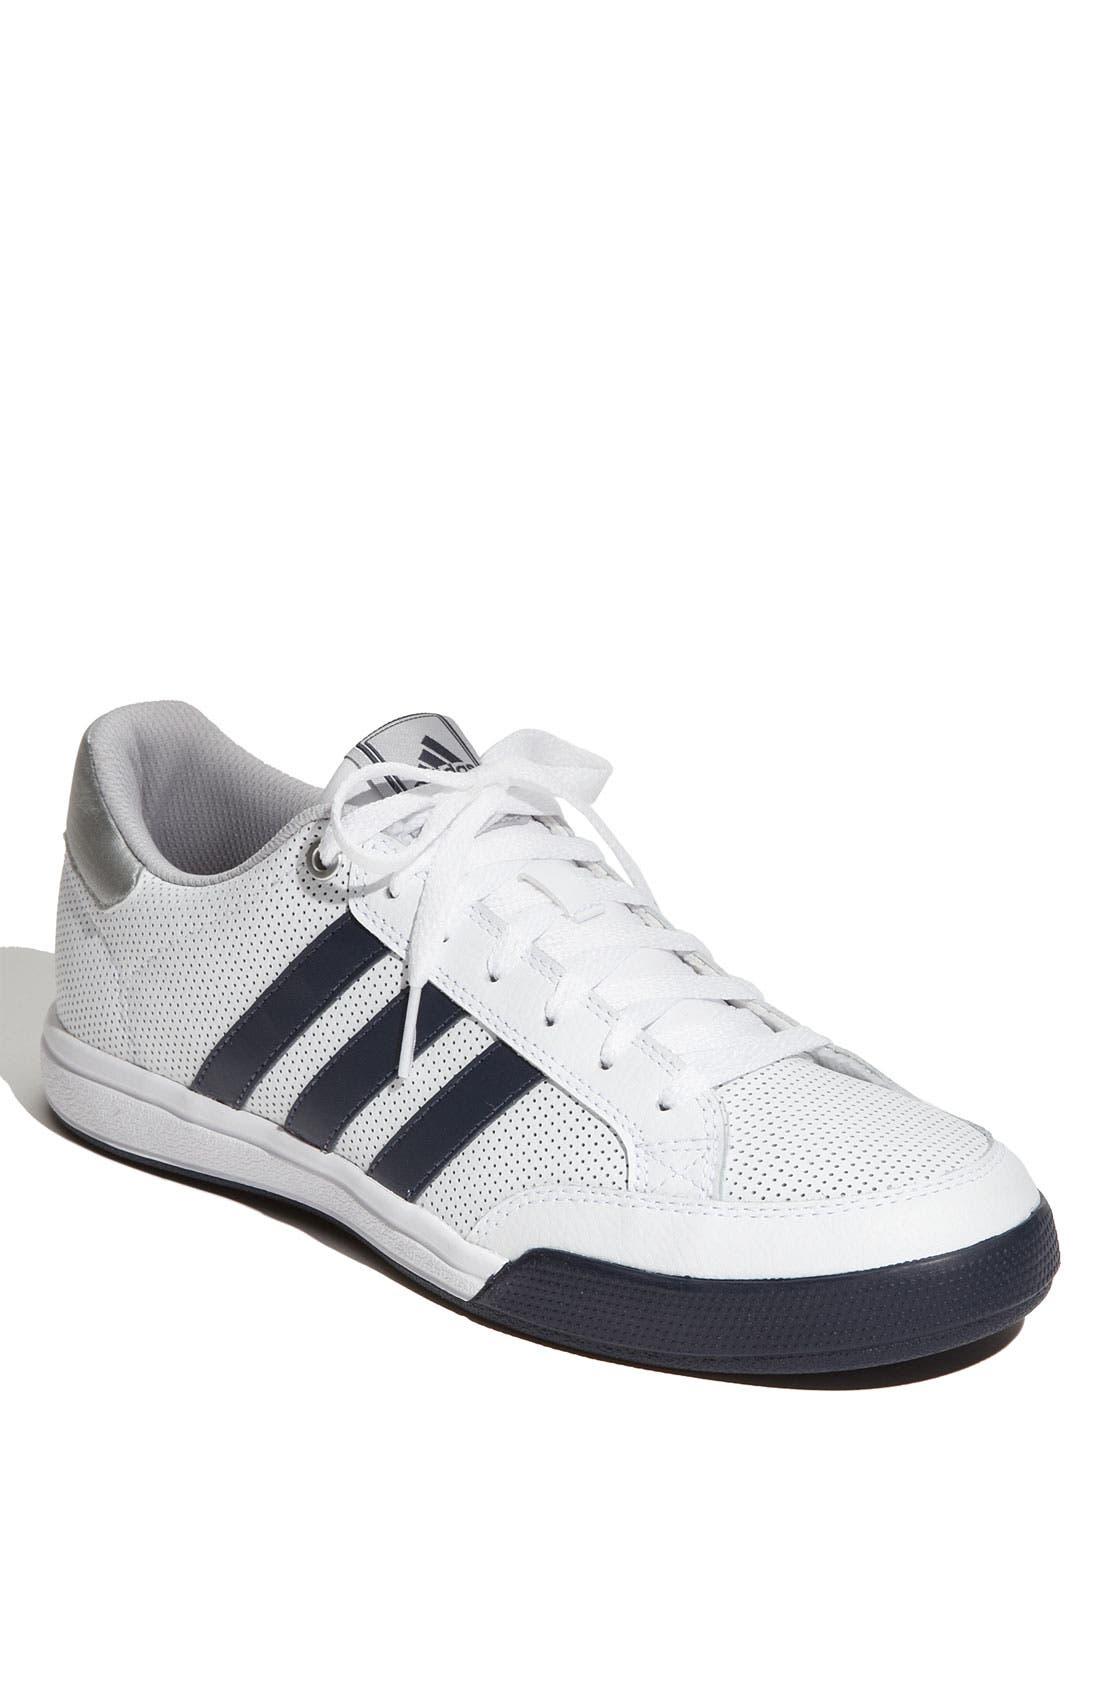 Main Image - adidas 'Oracle Stripes IV' Sneaker (Men)